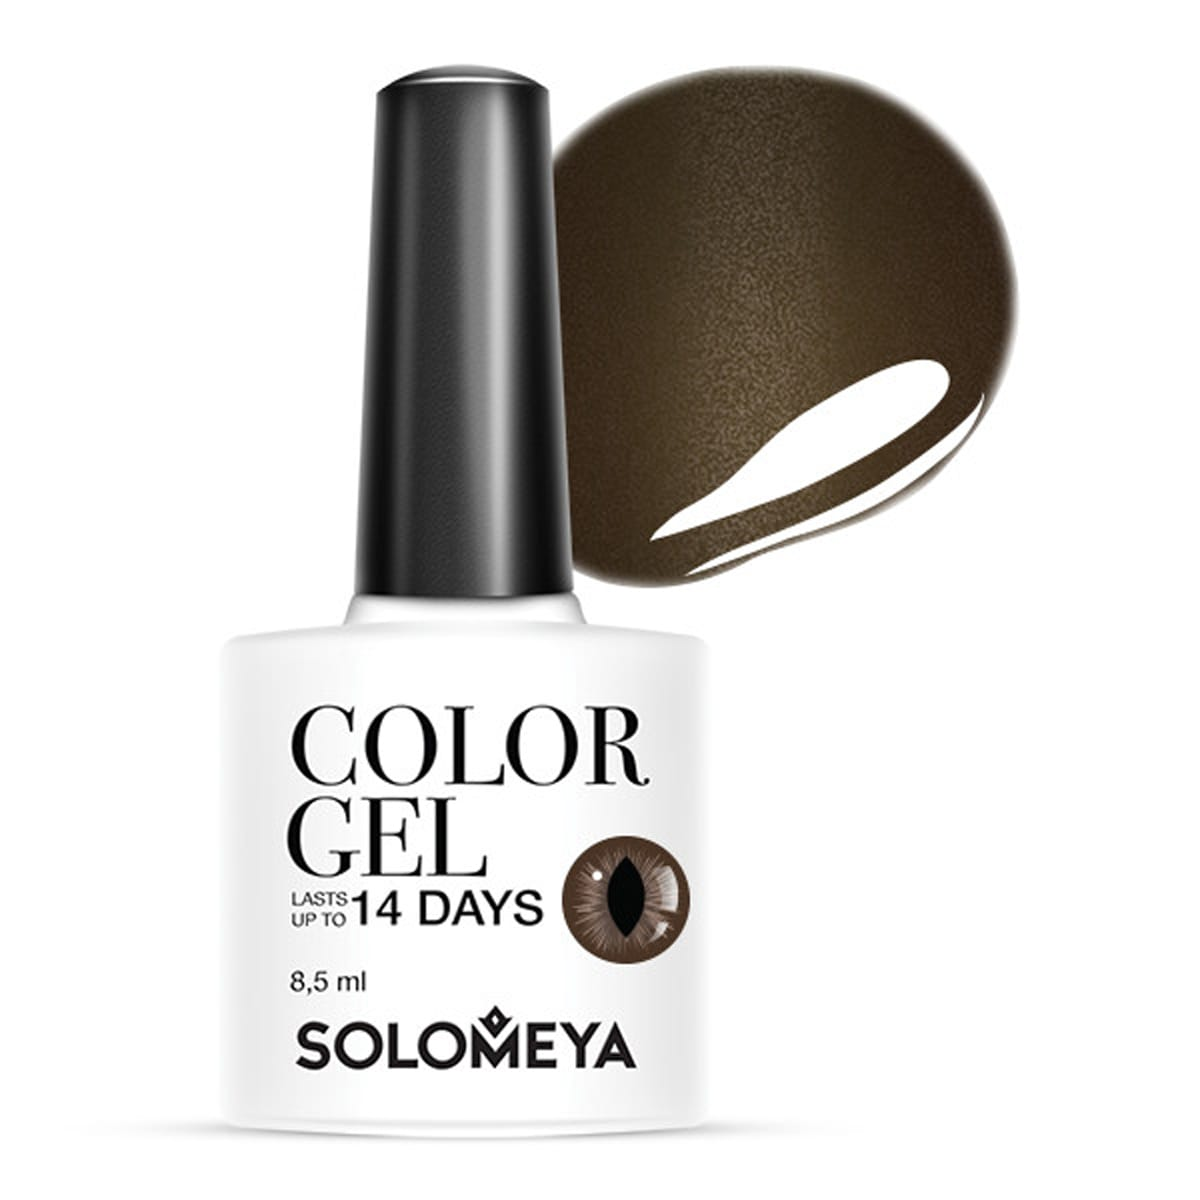 SOLOMEYA Гель-лак для ногтей SCE003 Кошачий глаз, темно-коричневый / Cat Eye Gel Dark Brown 8,5 мл цена